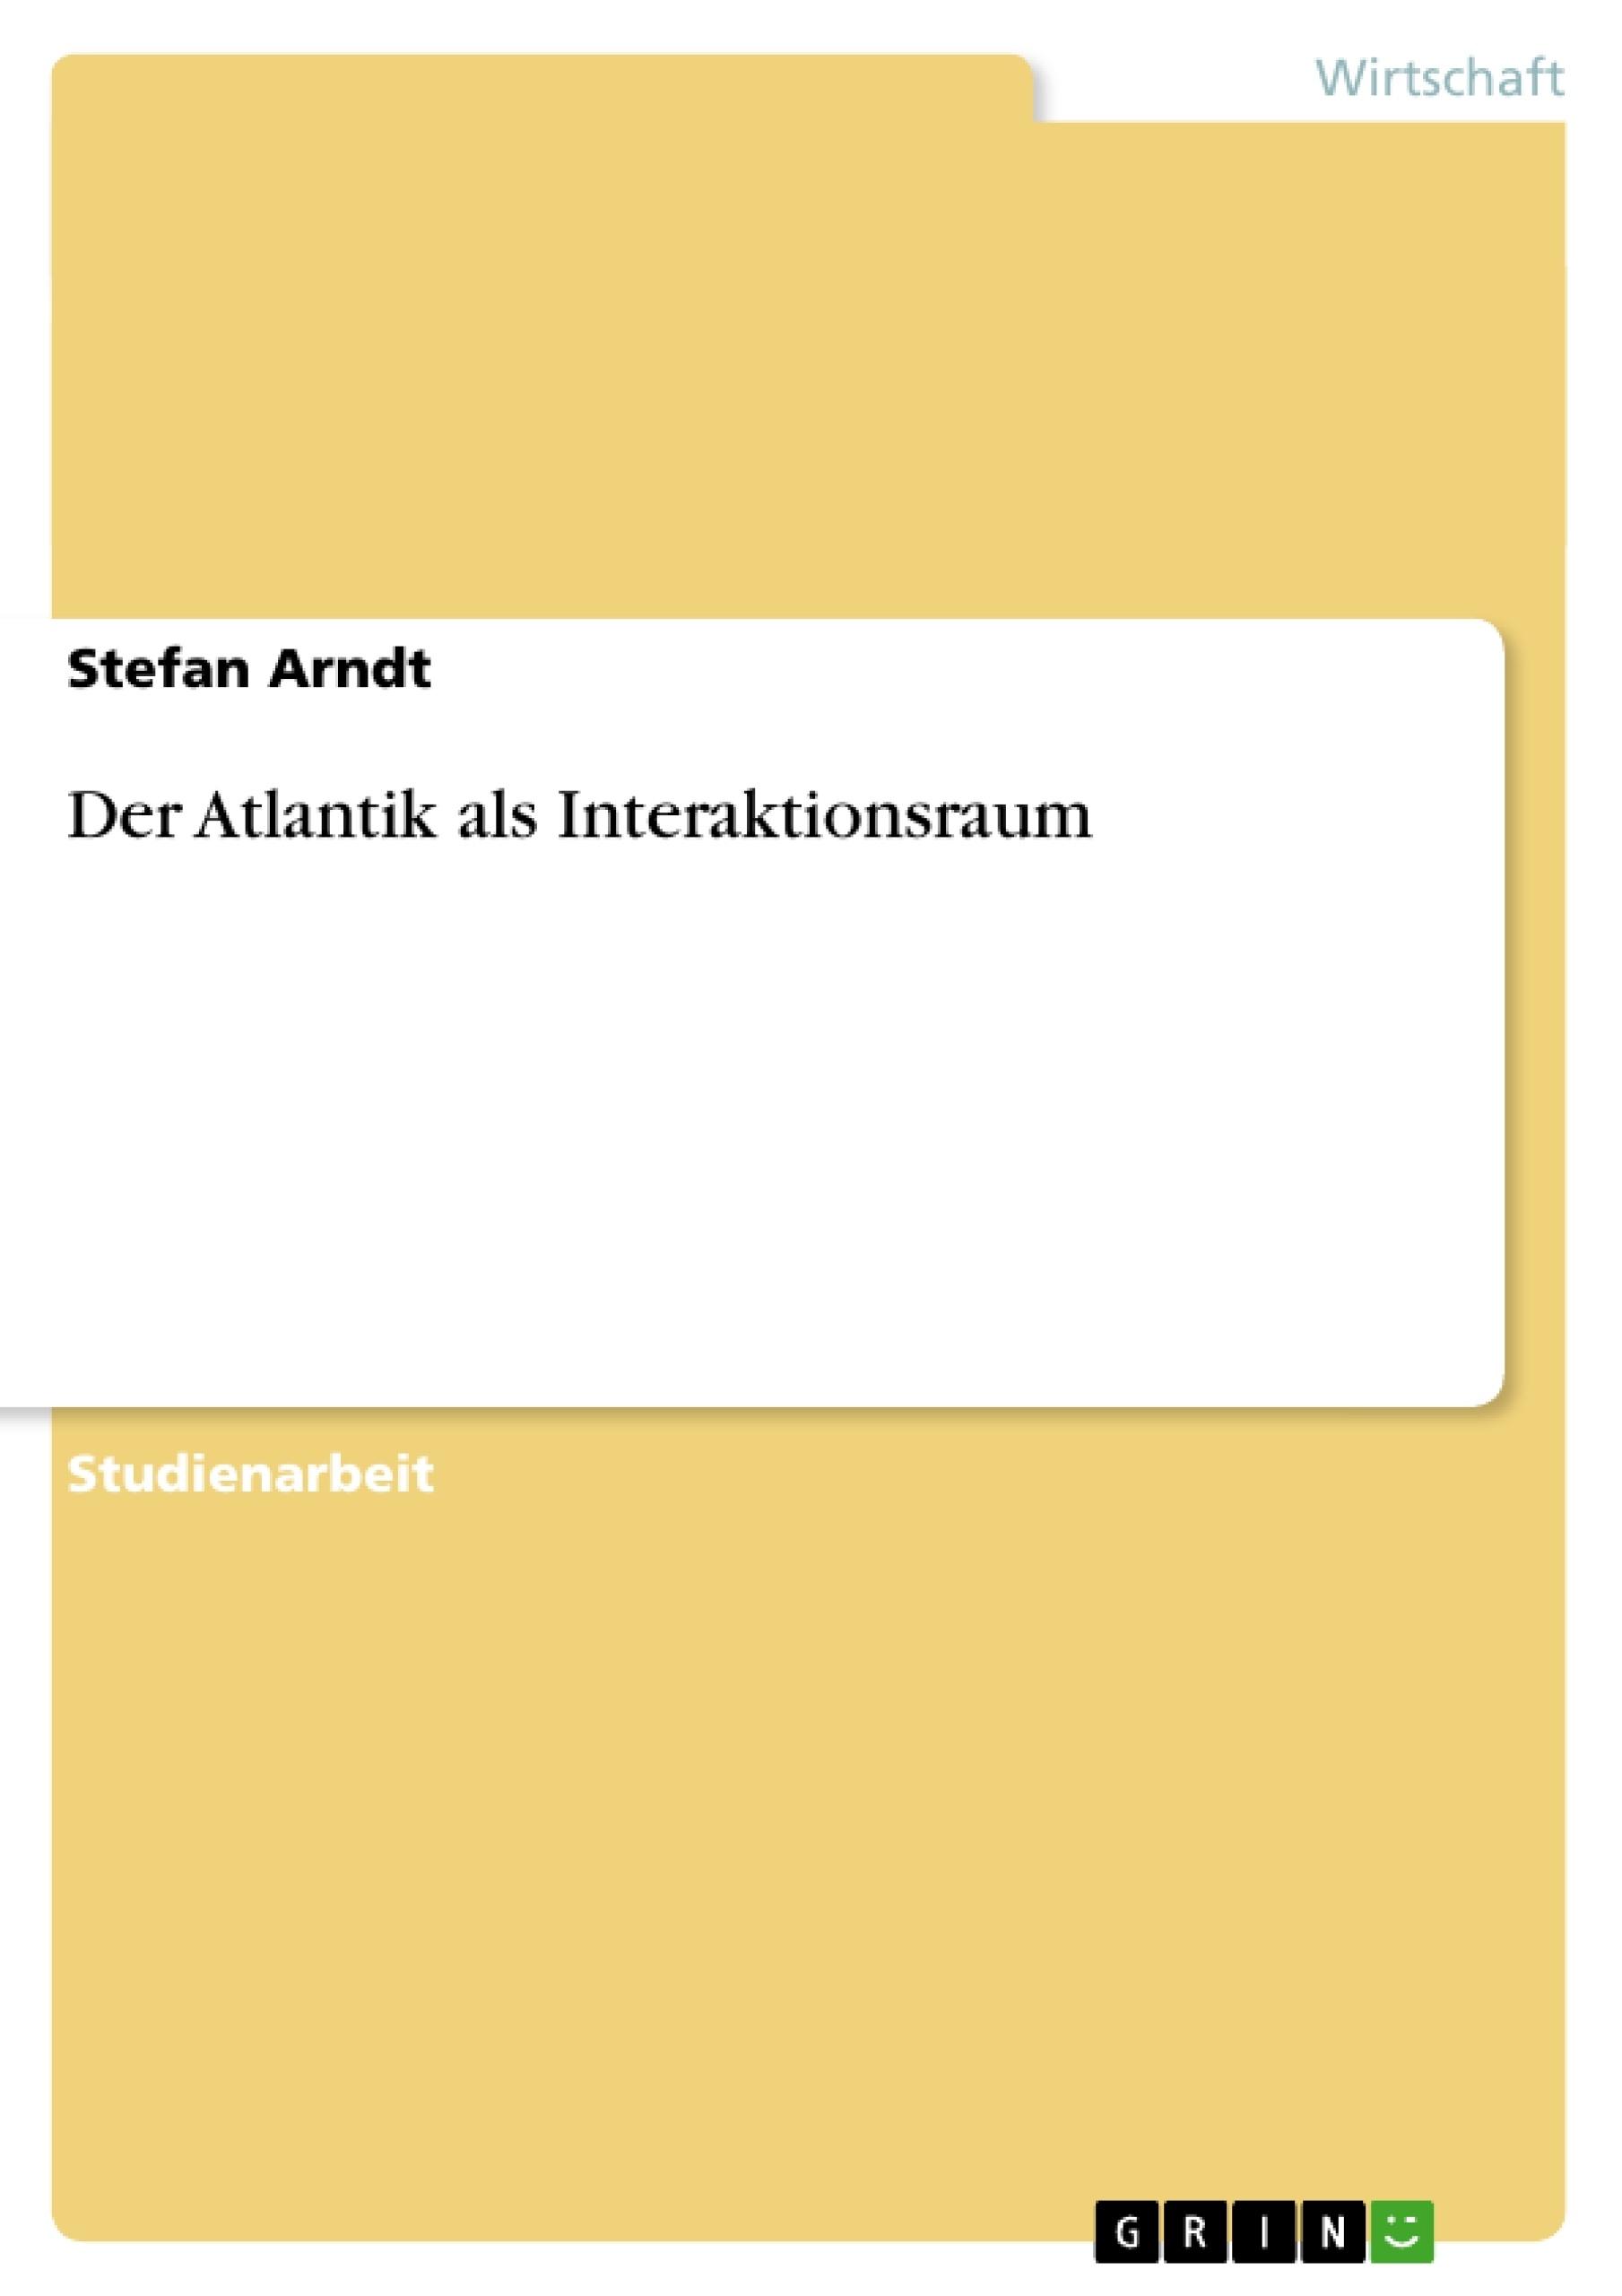 Titel: Der Atlantik als Interaktionsraum